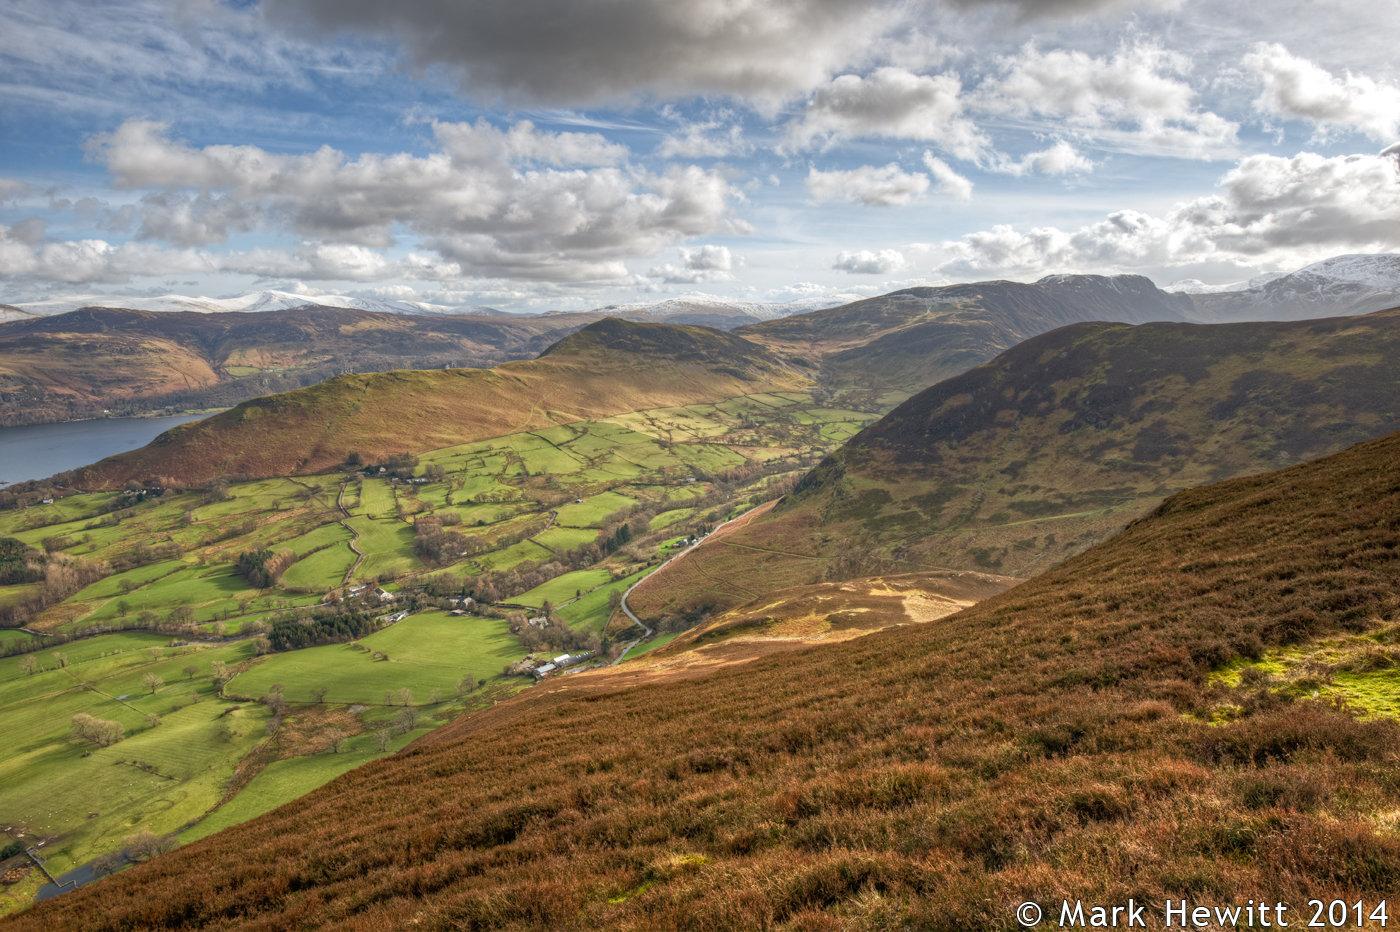 Newlands Valley & Catbells From Barrow Fell